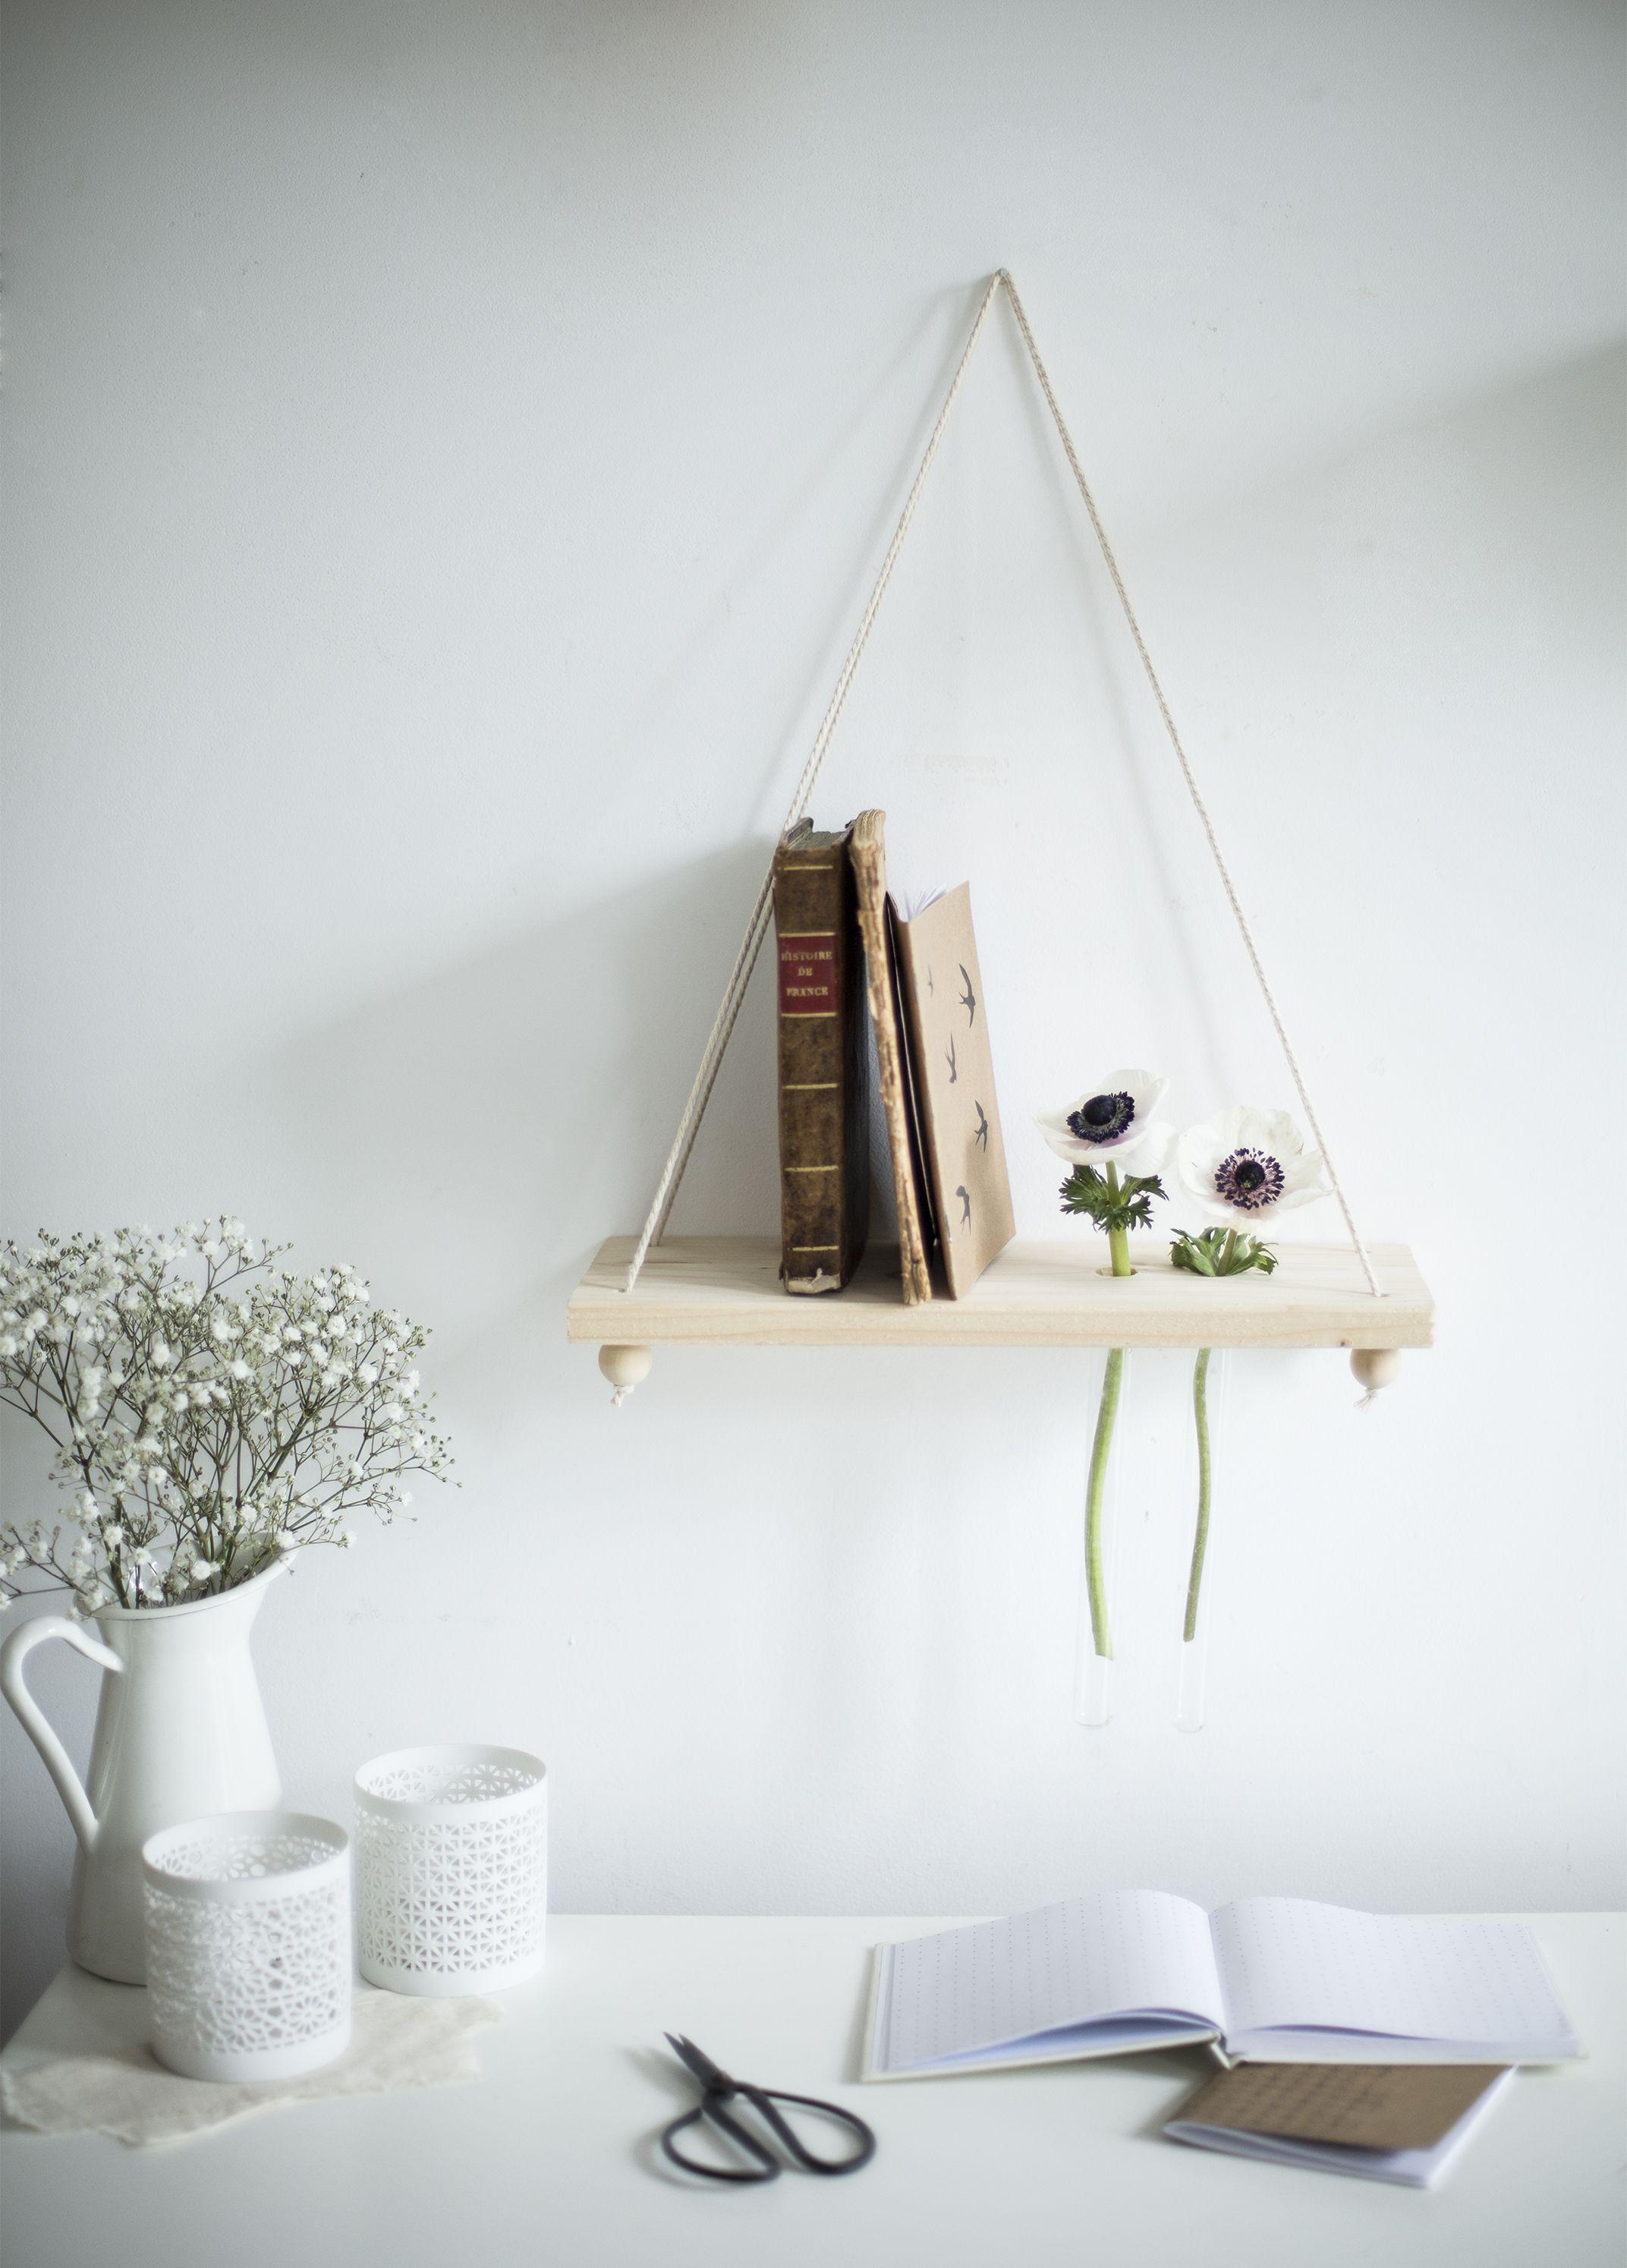 DIY ] Minimalist flower shelf- La Délicate Parenthèse | diy ...